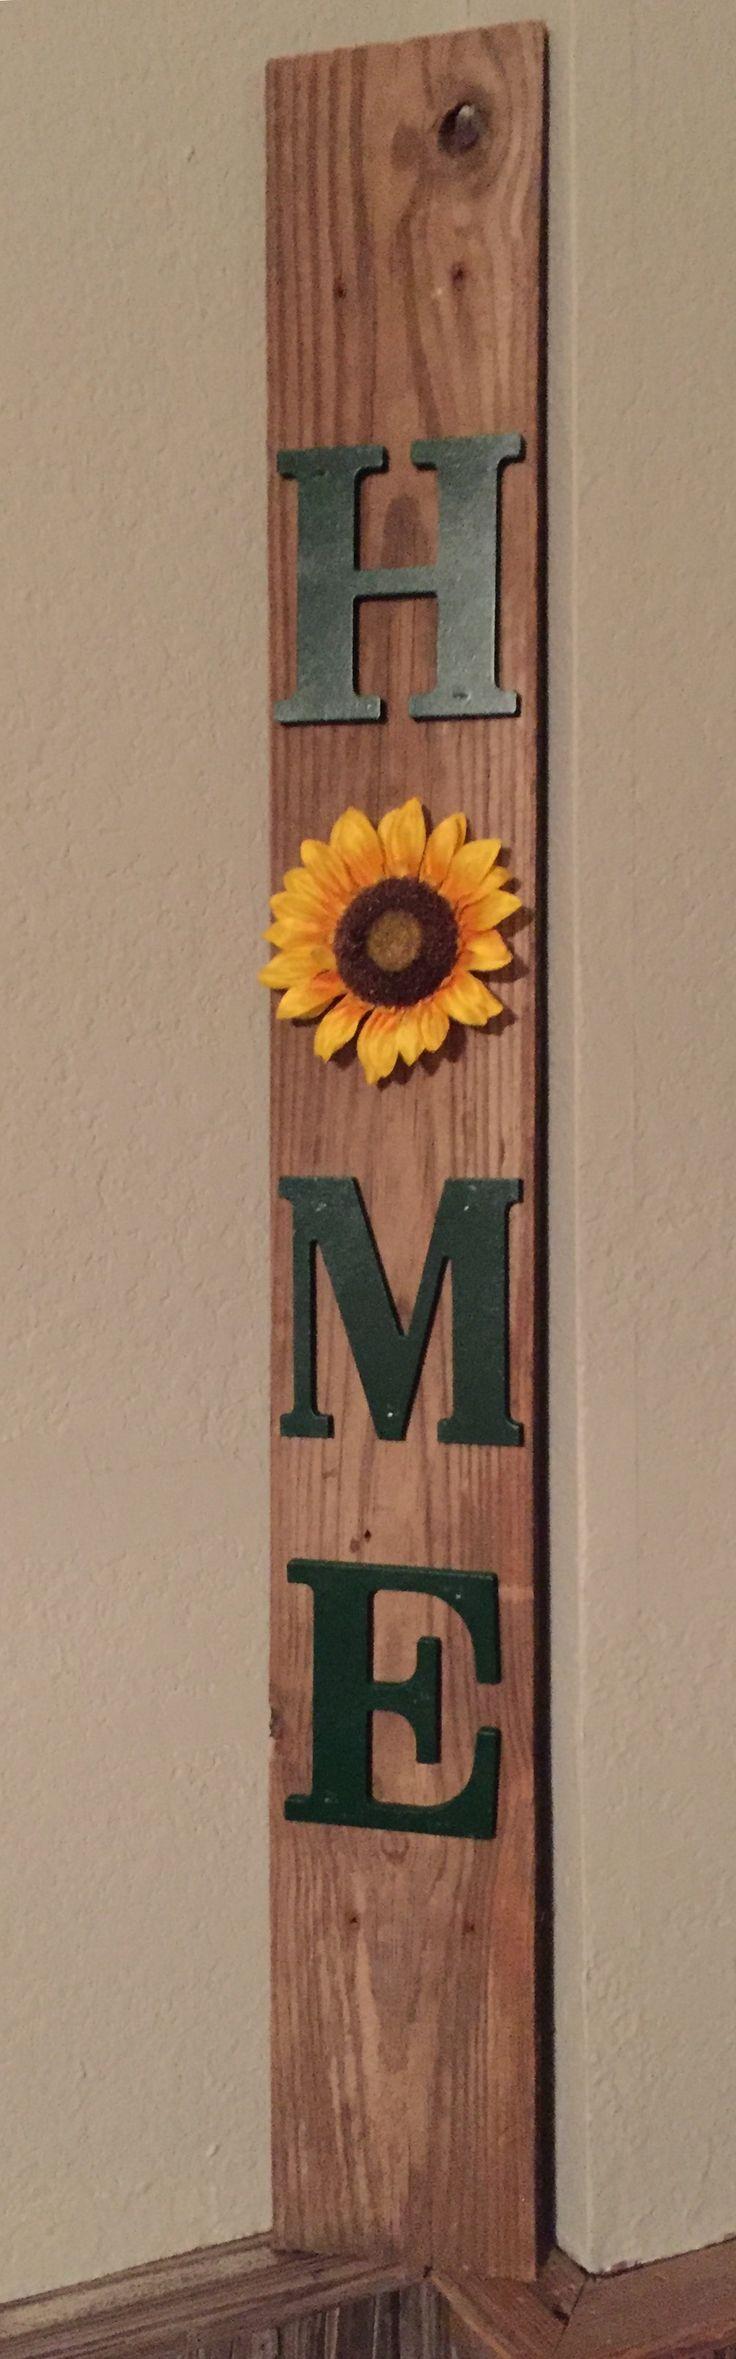 Sunflower home on pallet board